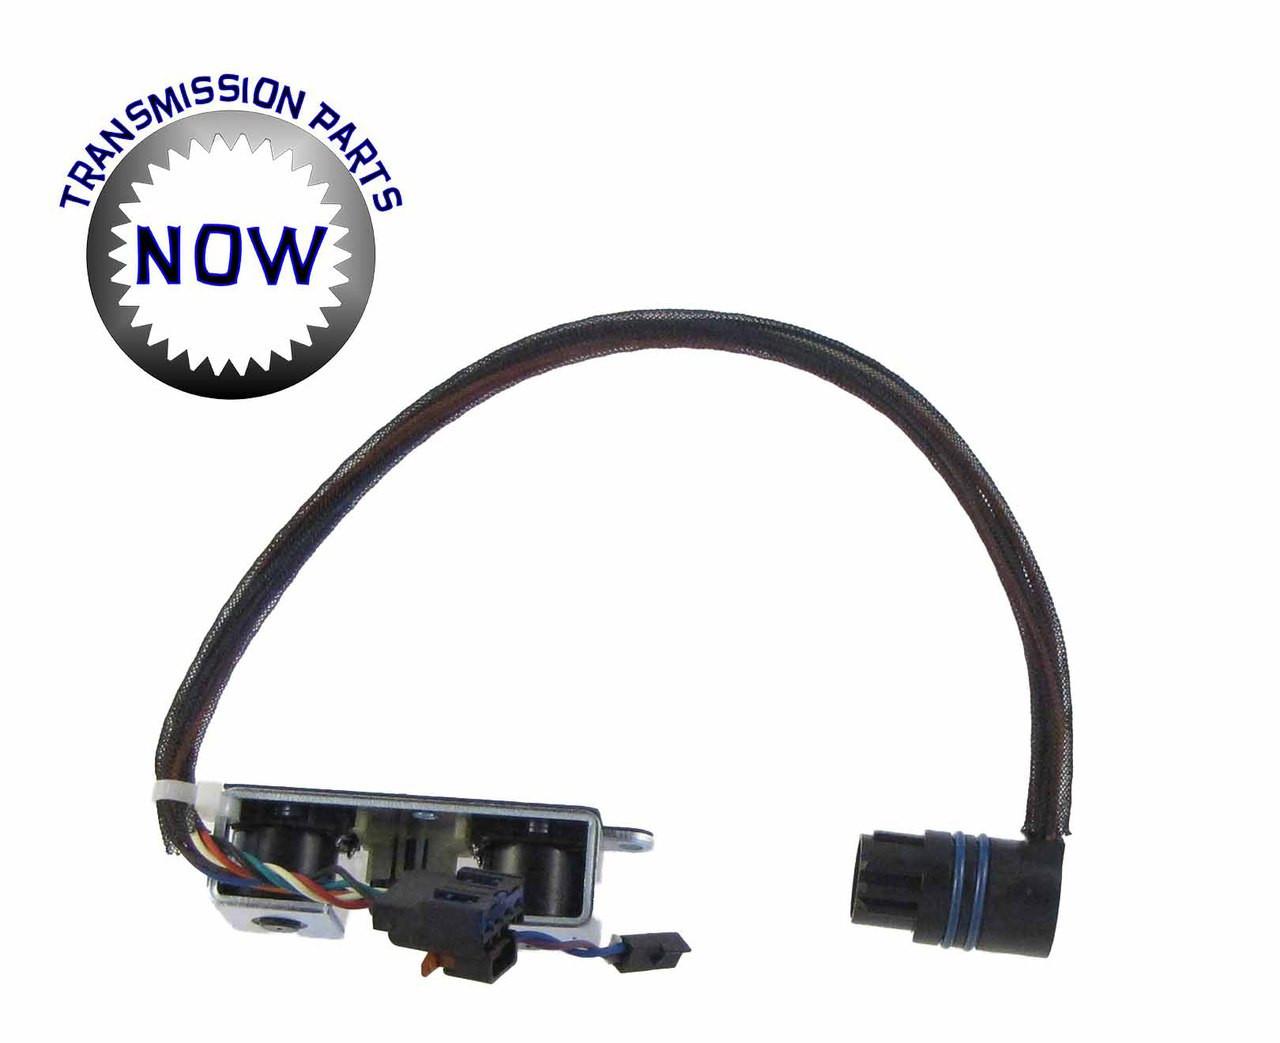 hight resolution of 4r75w transmission valve body diagram c5 transmission 4l60e accumulator installation 4l60e transmission wiring connector diagram